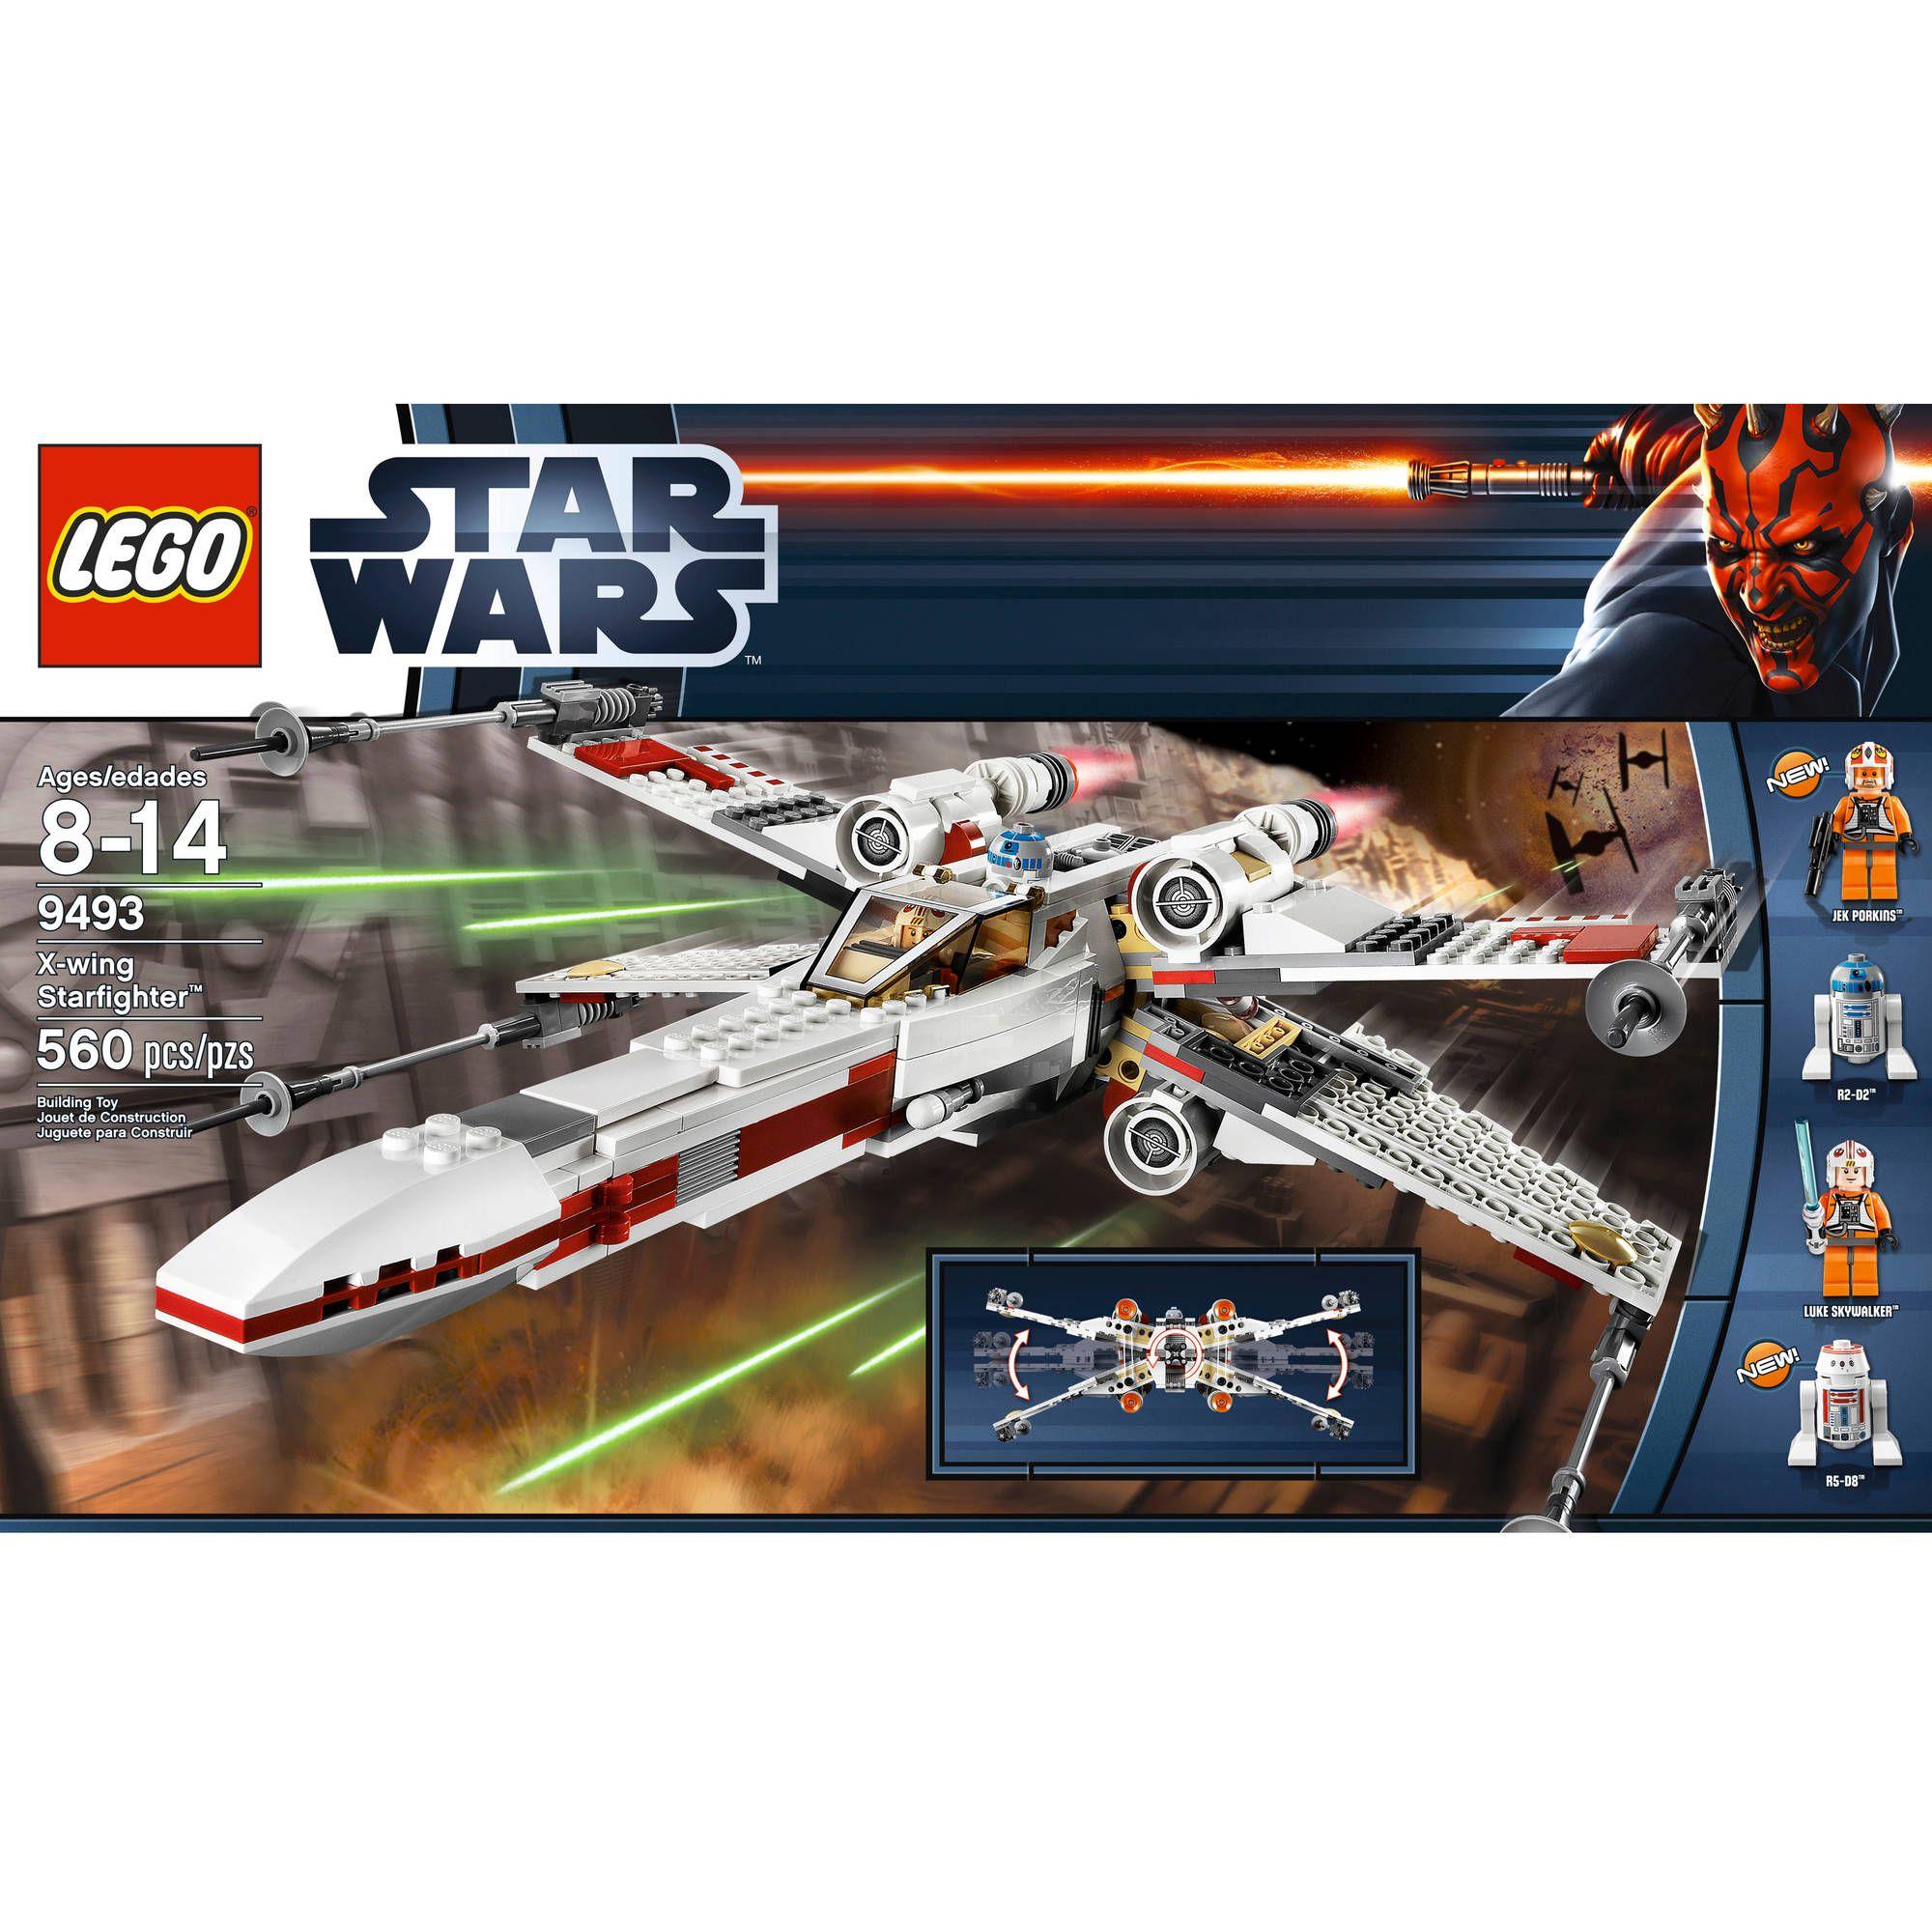 Lego Star Wars X Wing Starfighter Star Wars Set Lego Star Wars Sets X Wing Starfighter